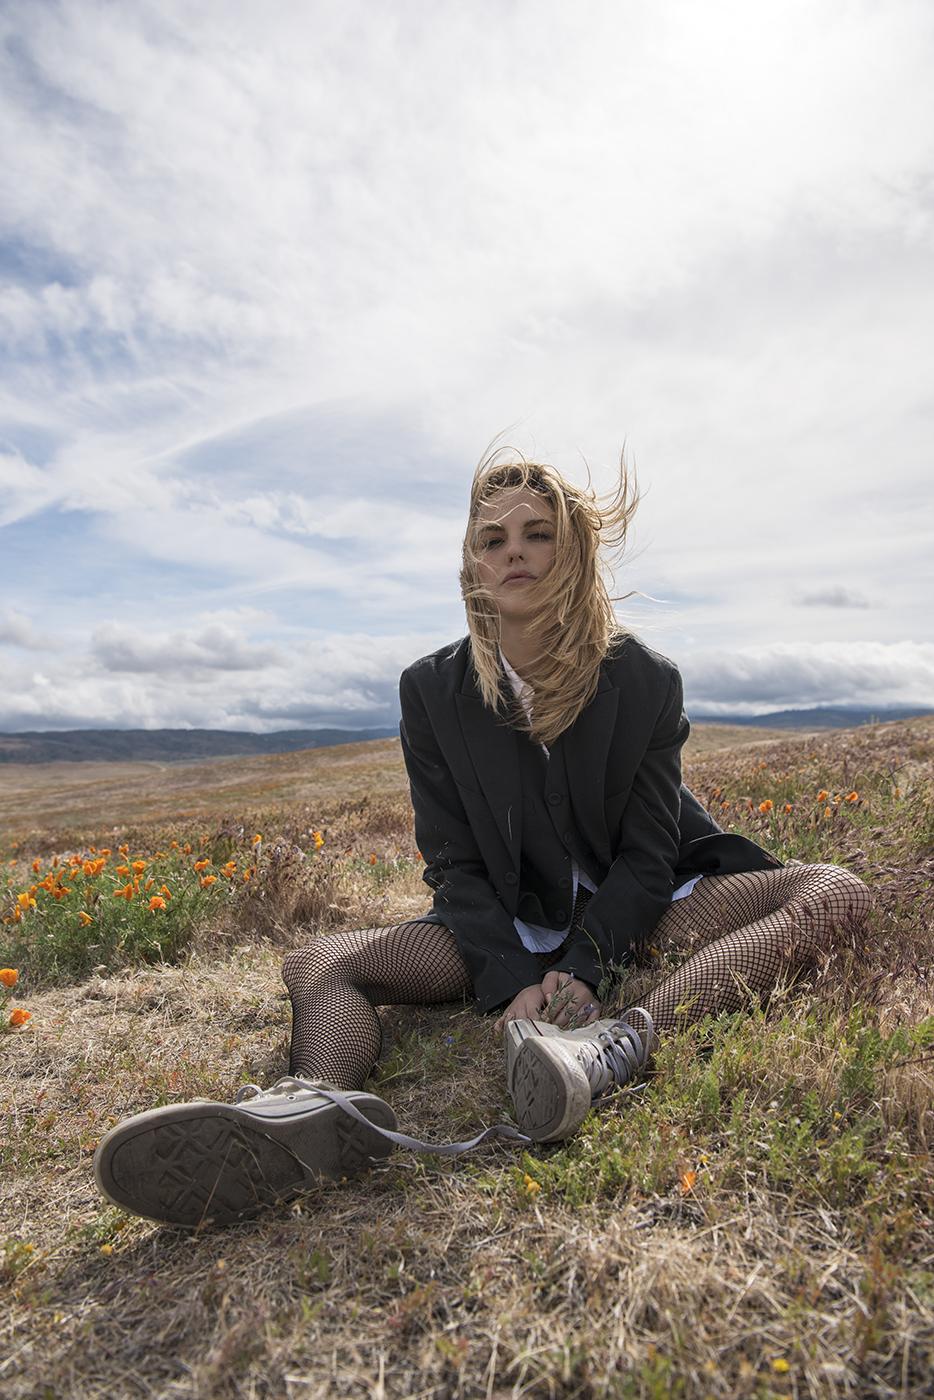 Chloe Brooks, Actress